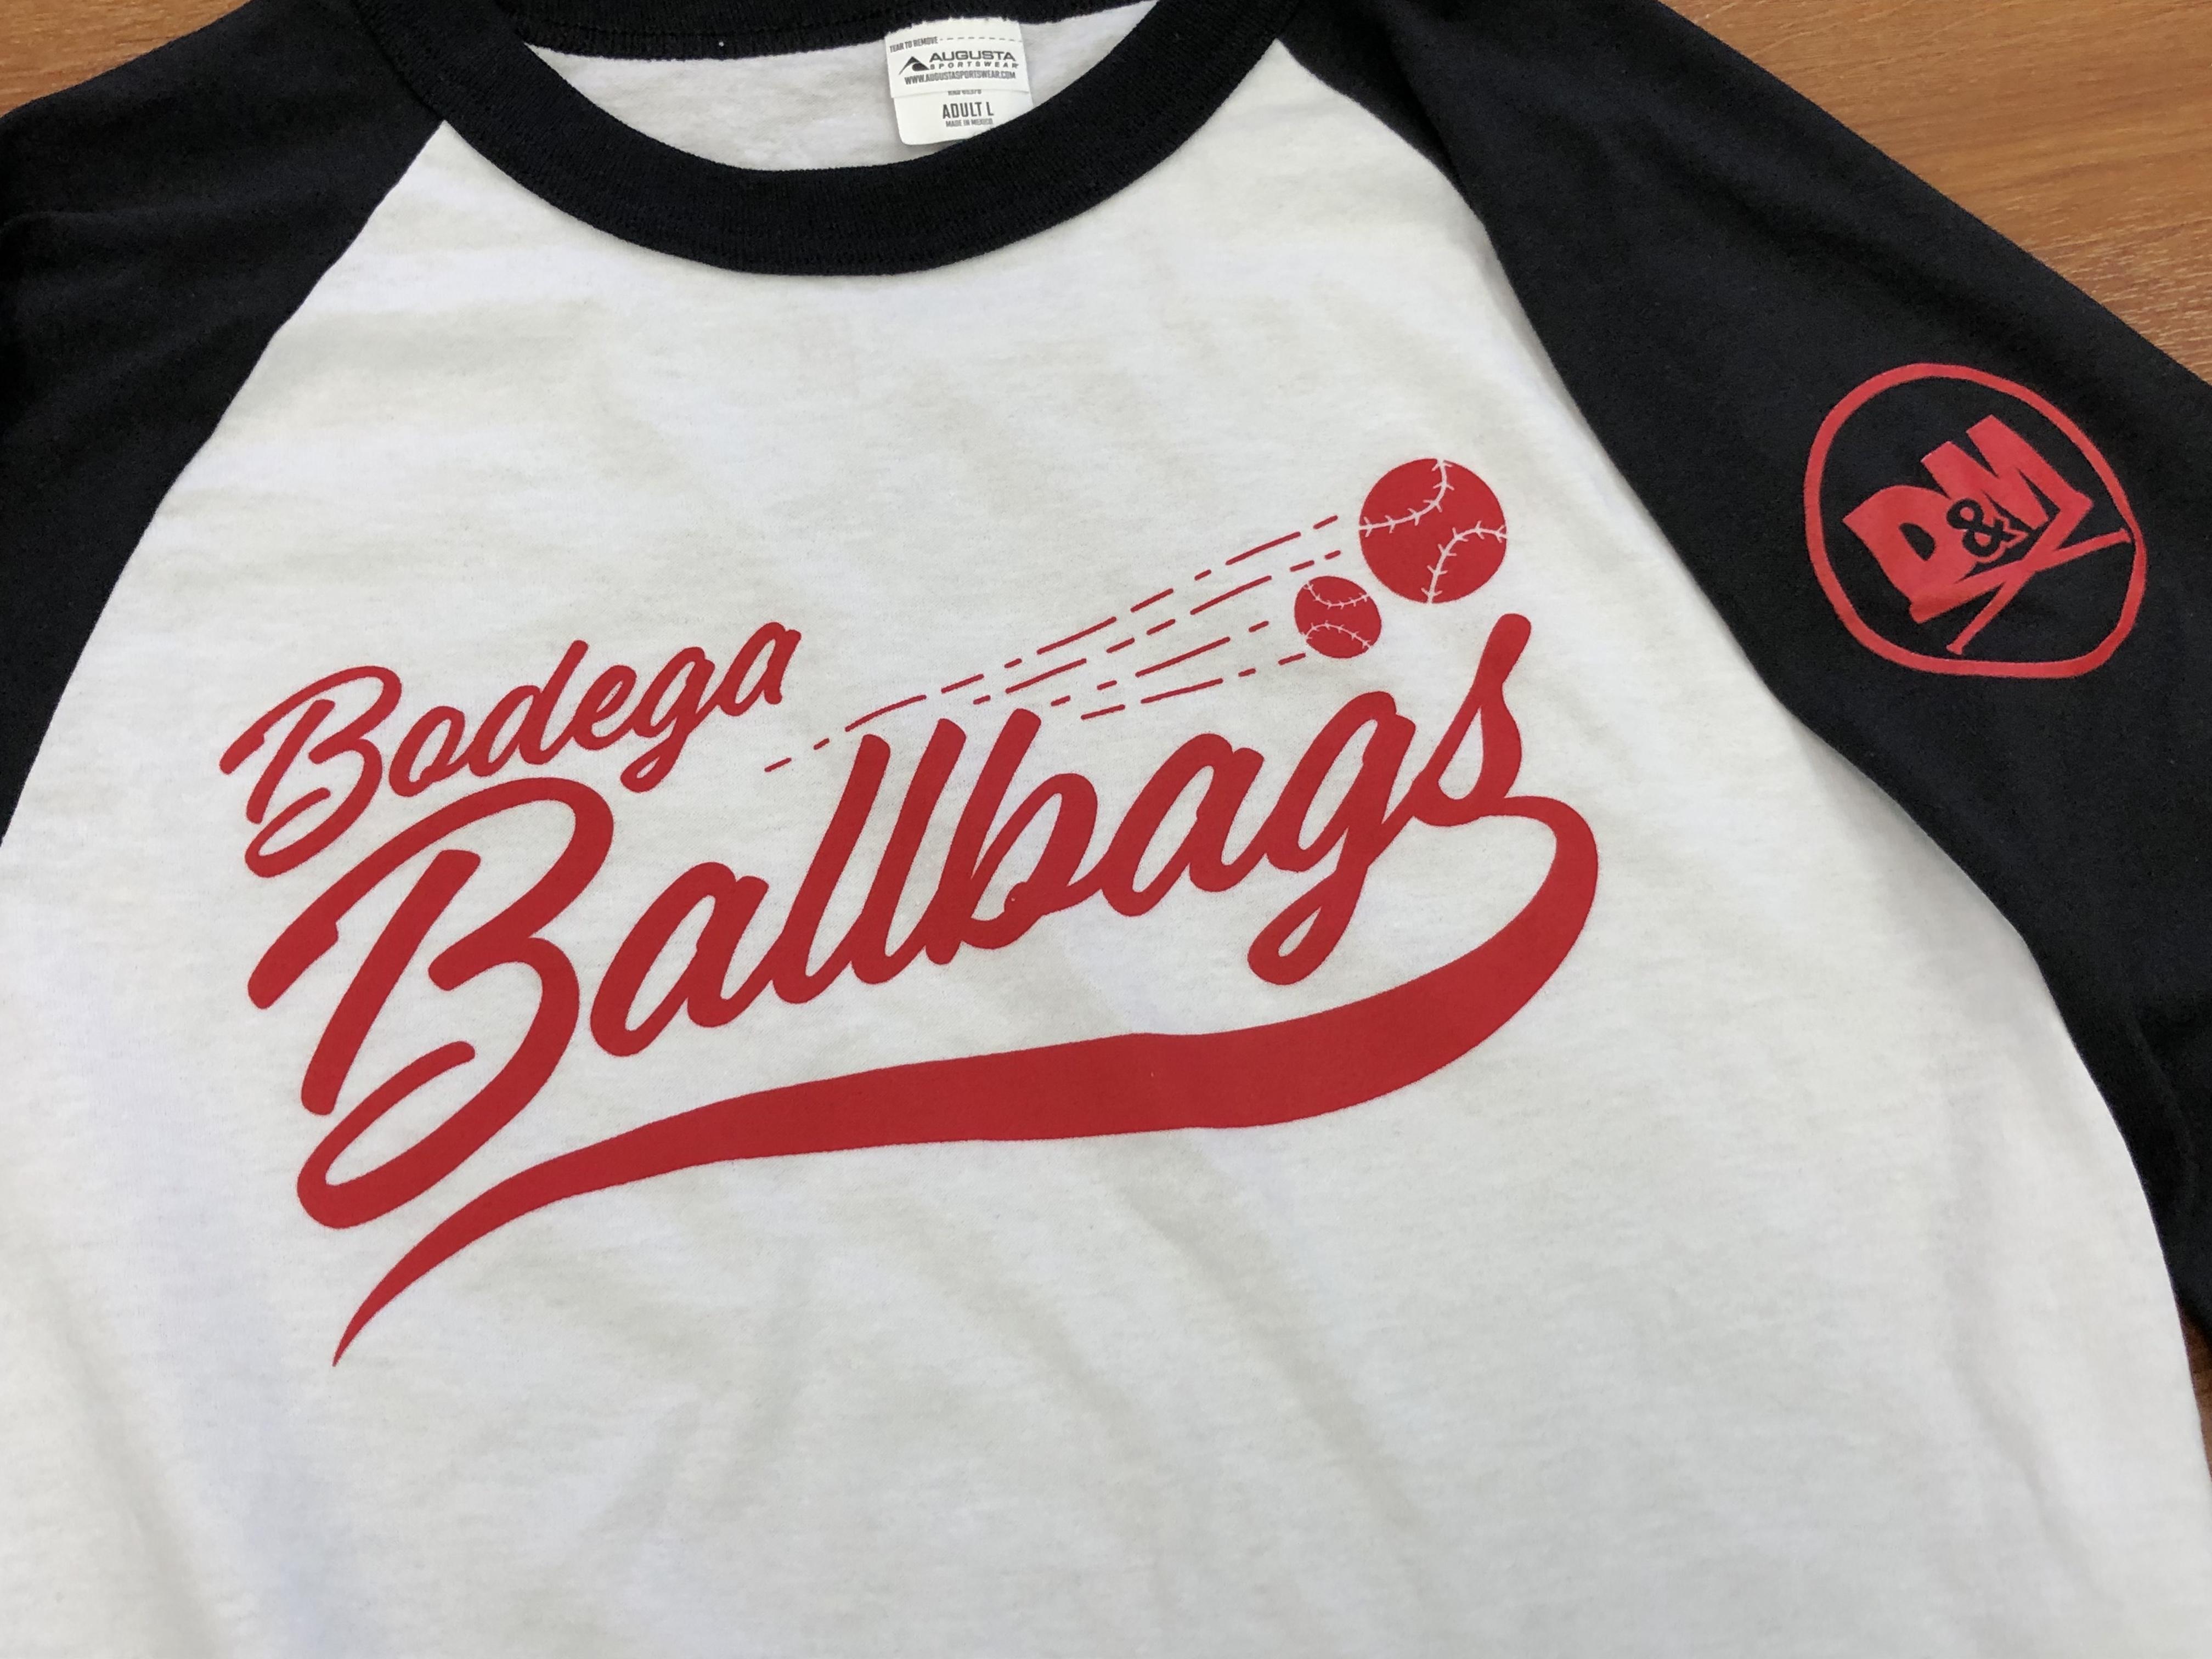 Bodega Ballbags